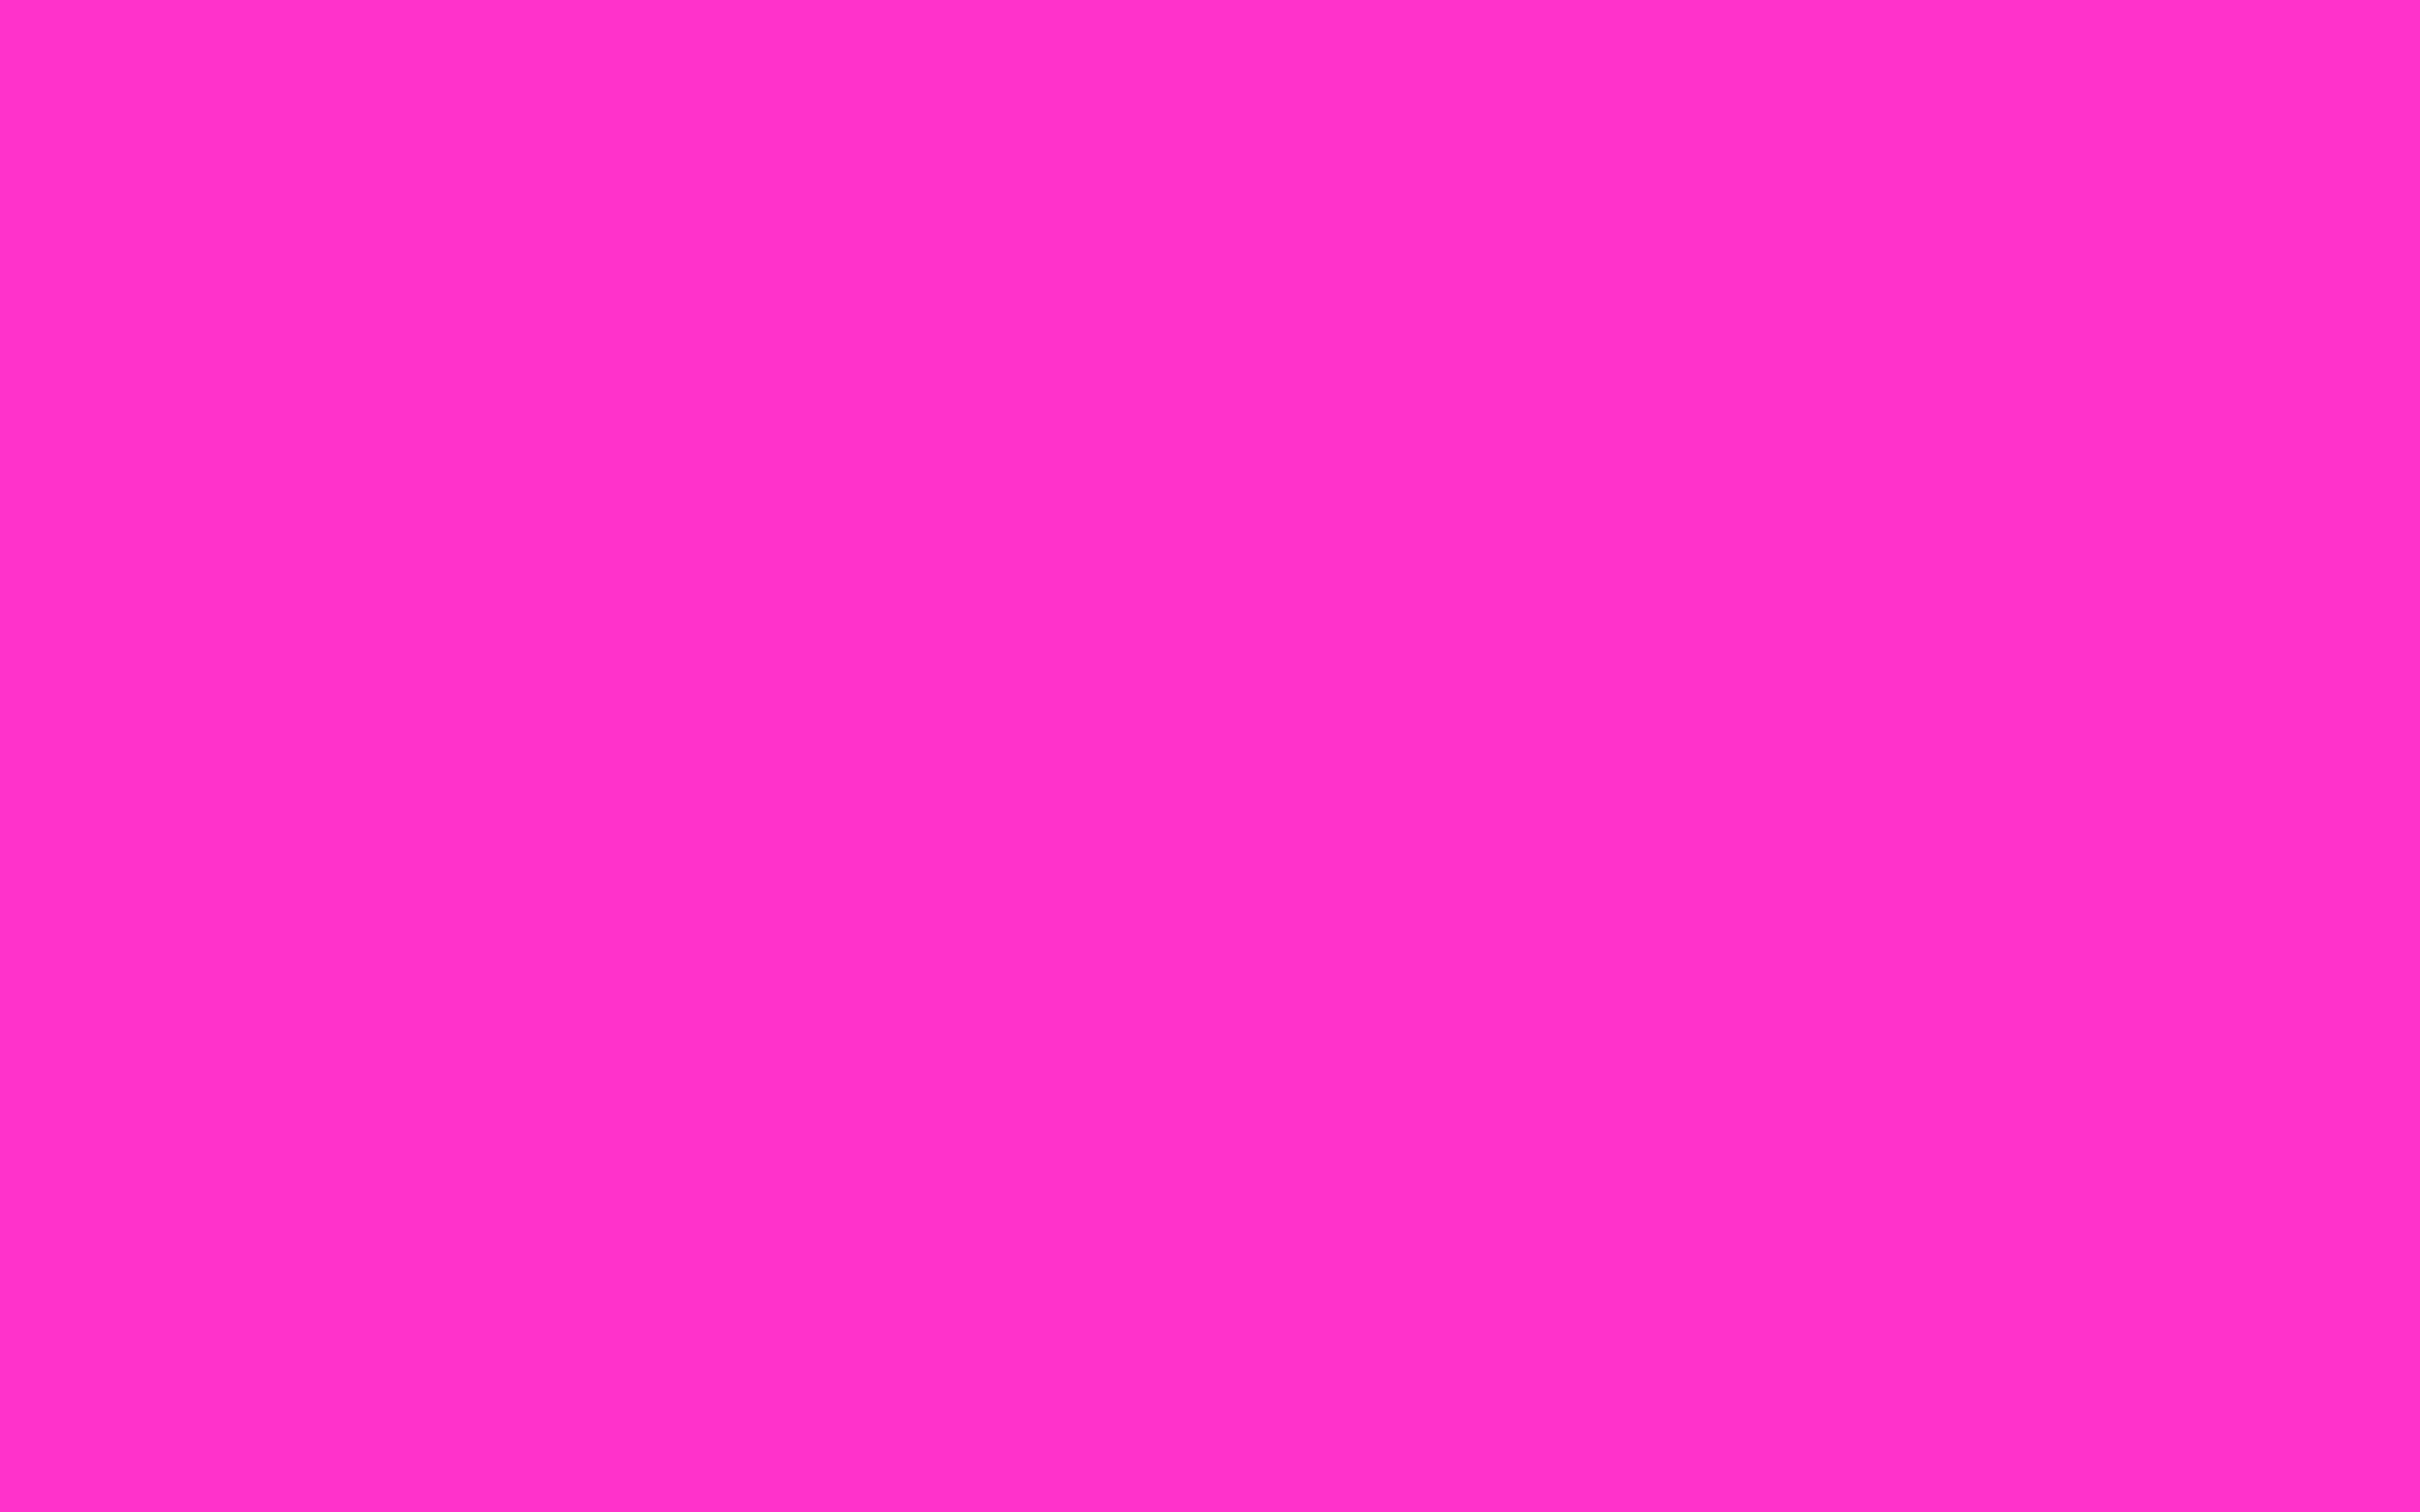 2560x1600 Razzle Dazzle Rose Solid Color Background